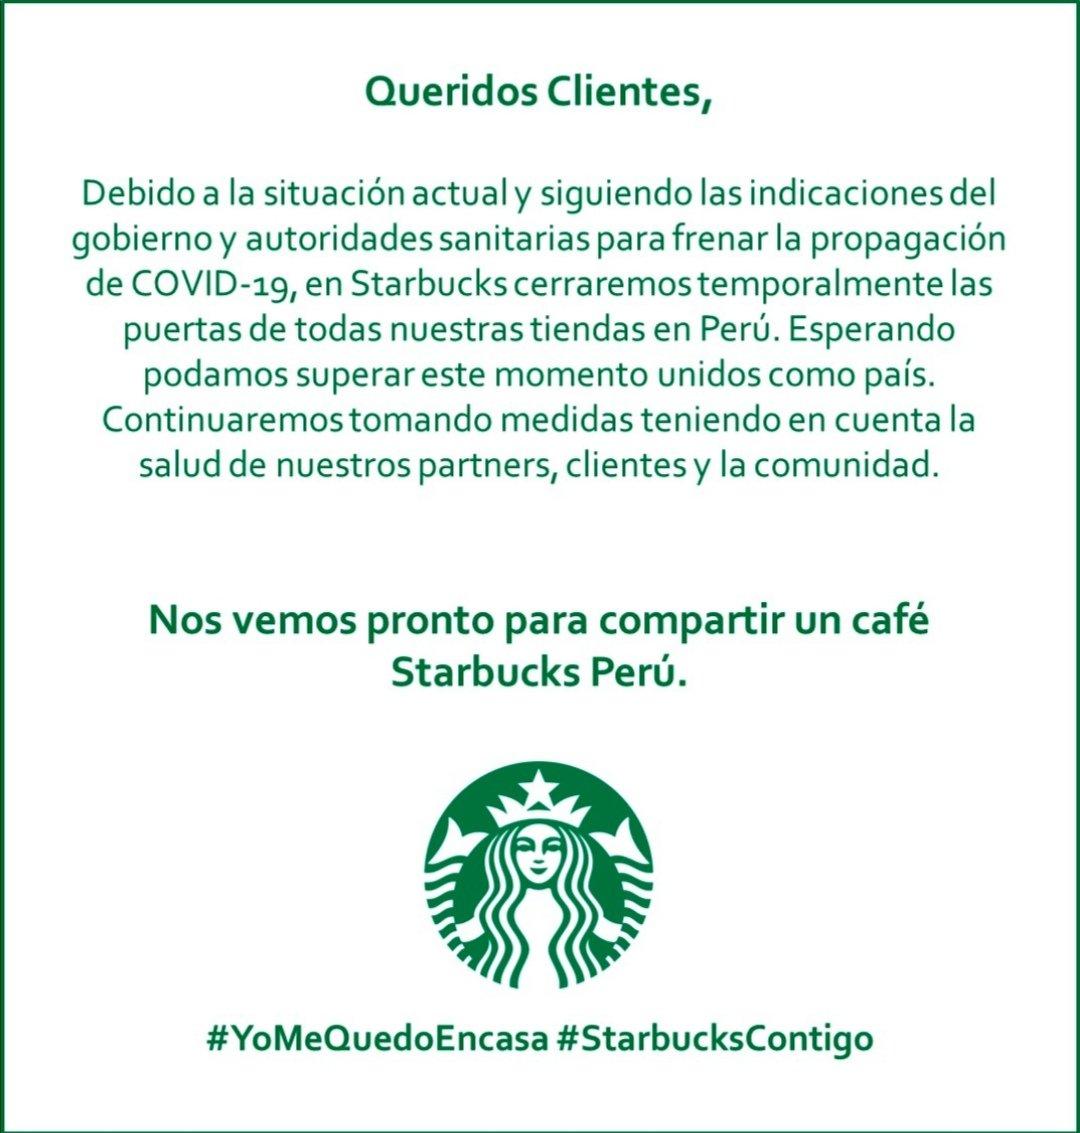 Nos vemos pronto para compartir una taza de café #YoMeQuedoEnCasa https://t.co/bclMDlkCYi